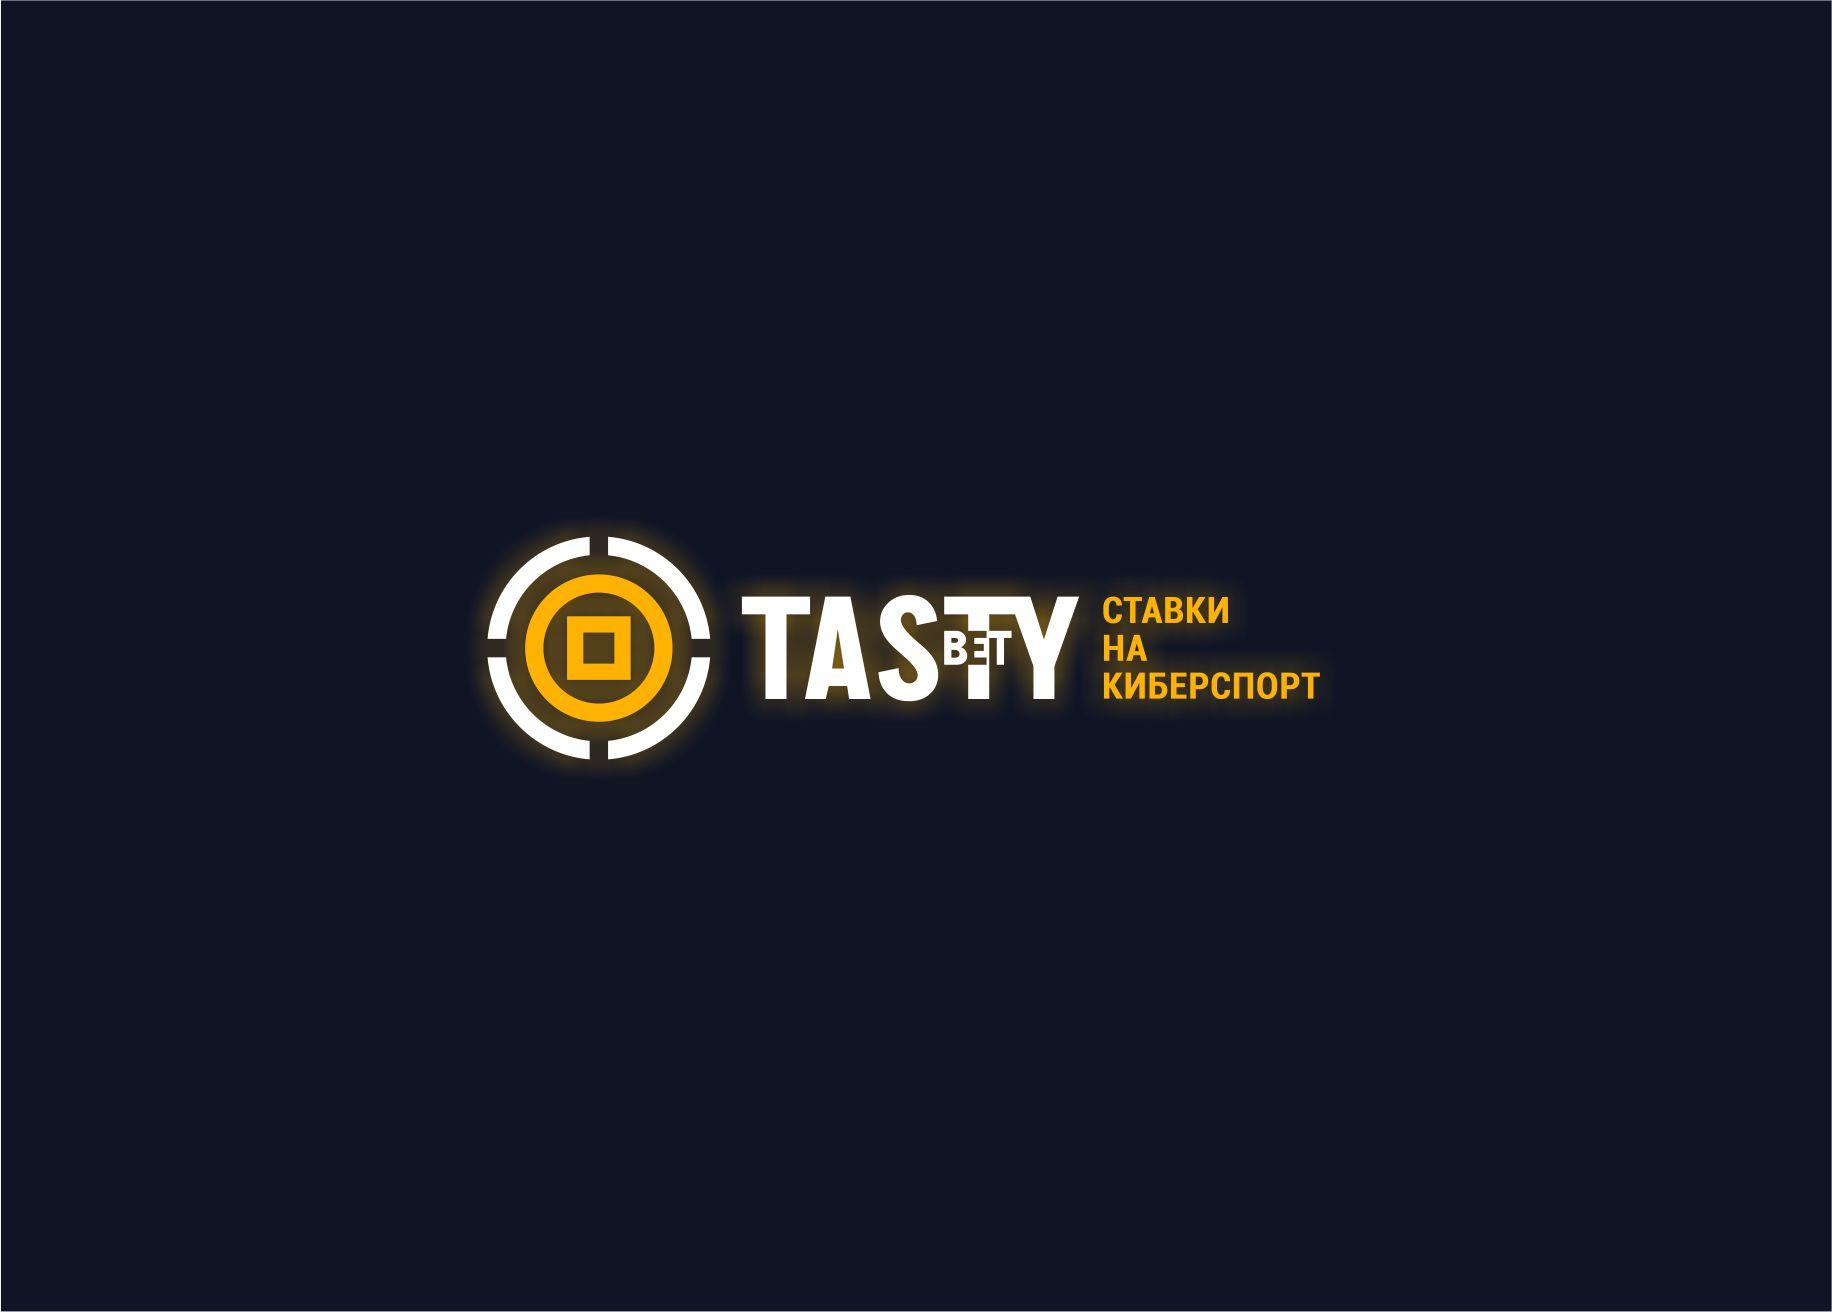 Нарисовать логотип для сайта со ставками для киберматчей фото f_4095b4af06b36918.jpg